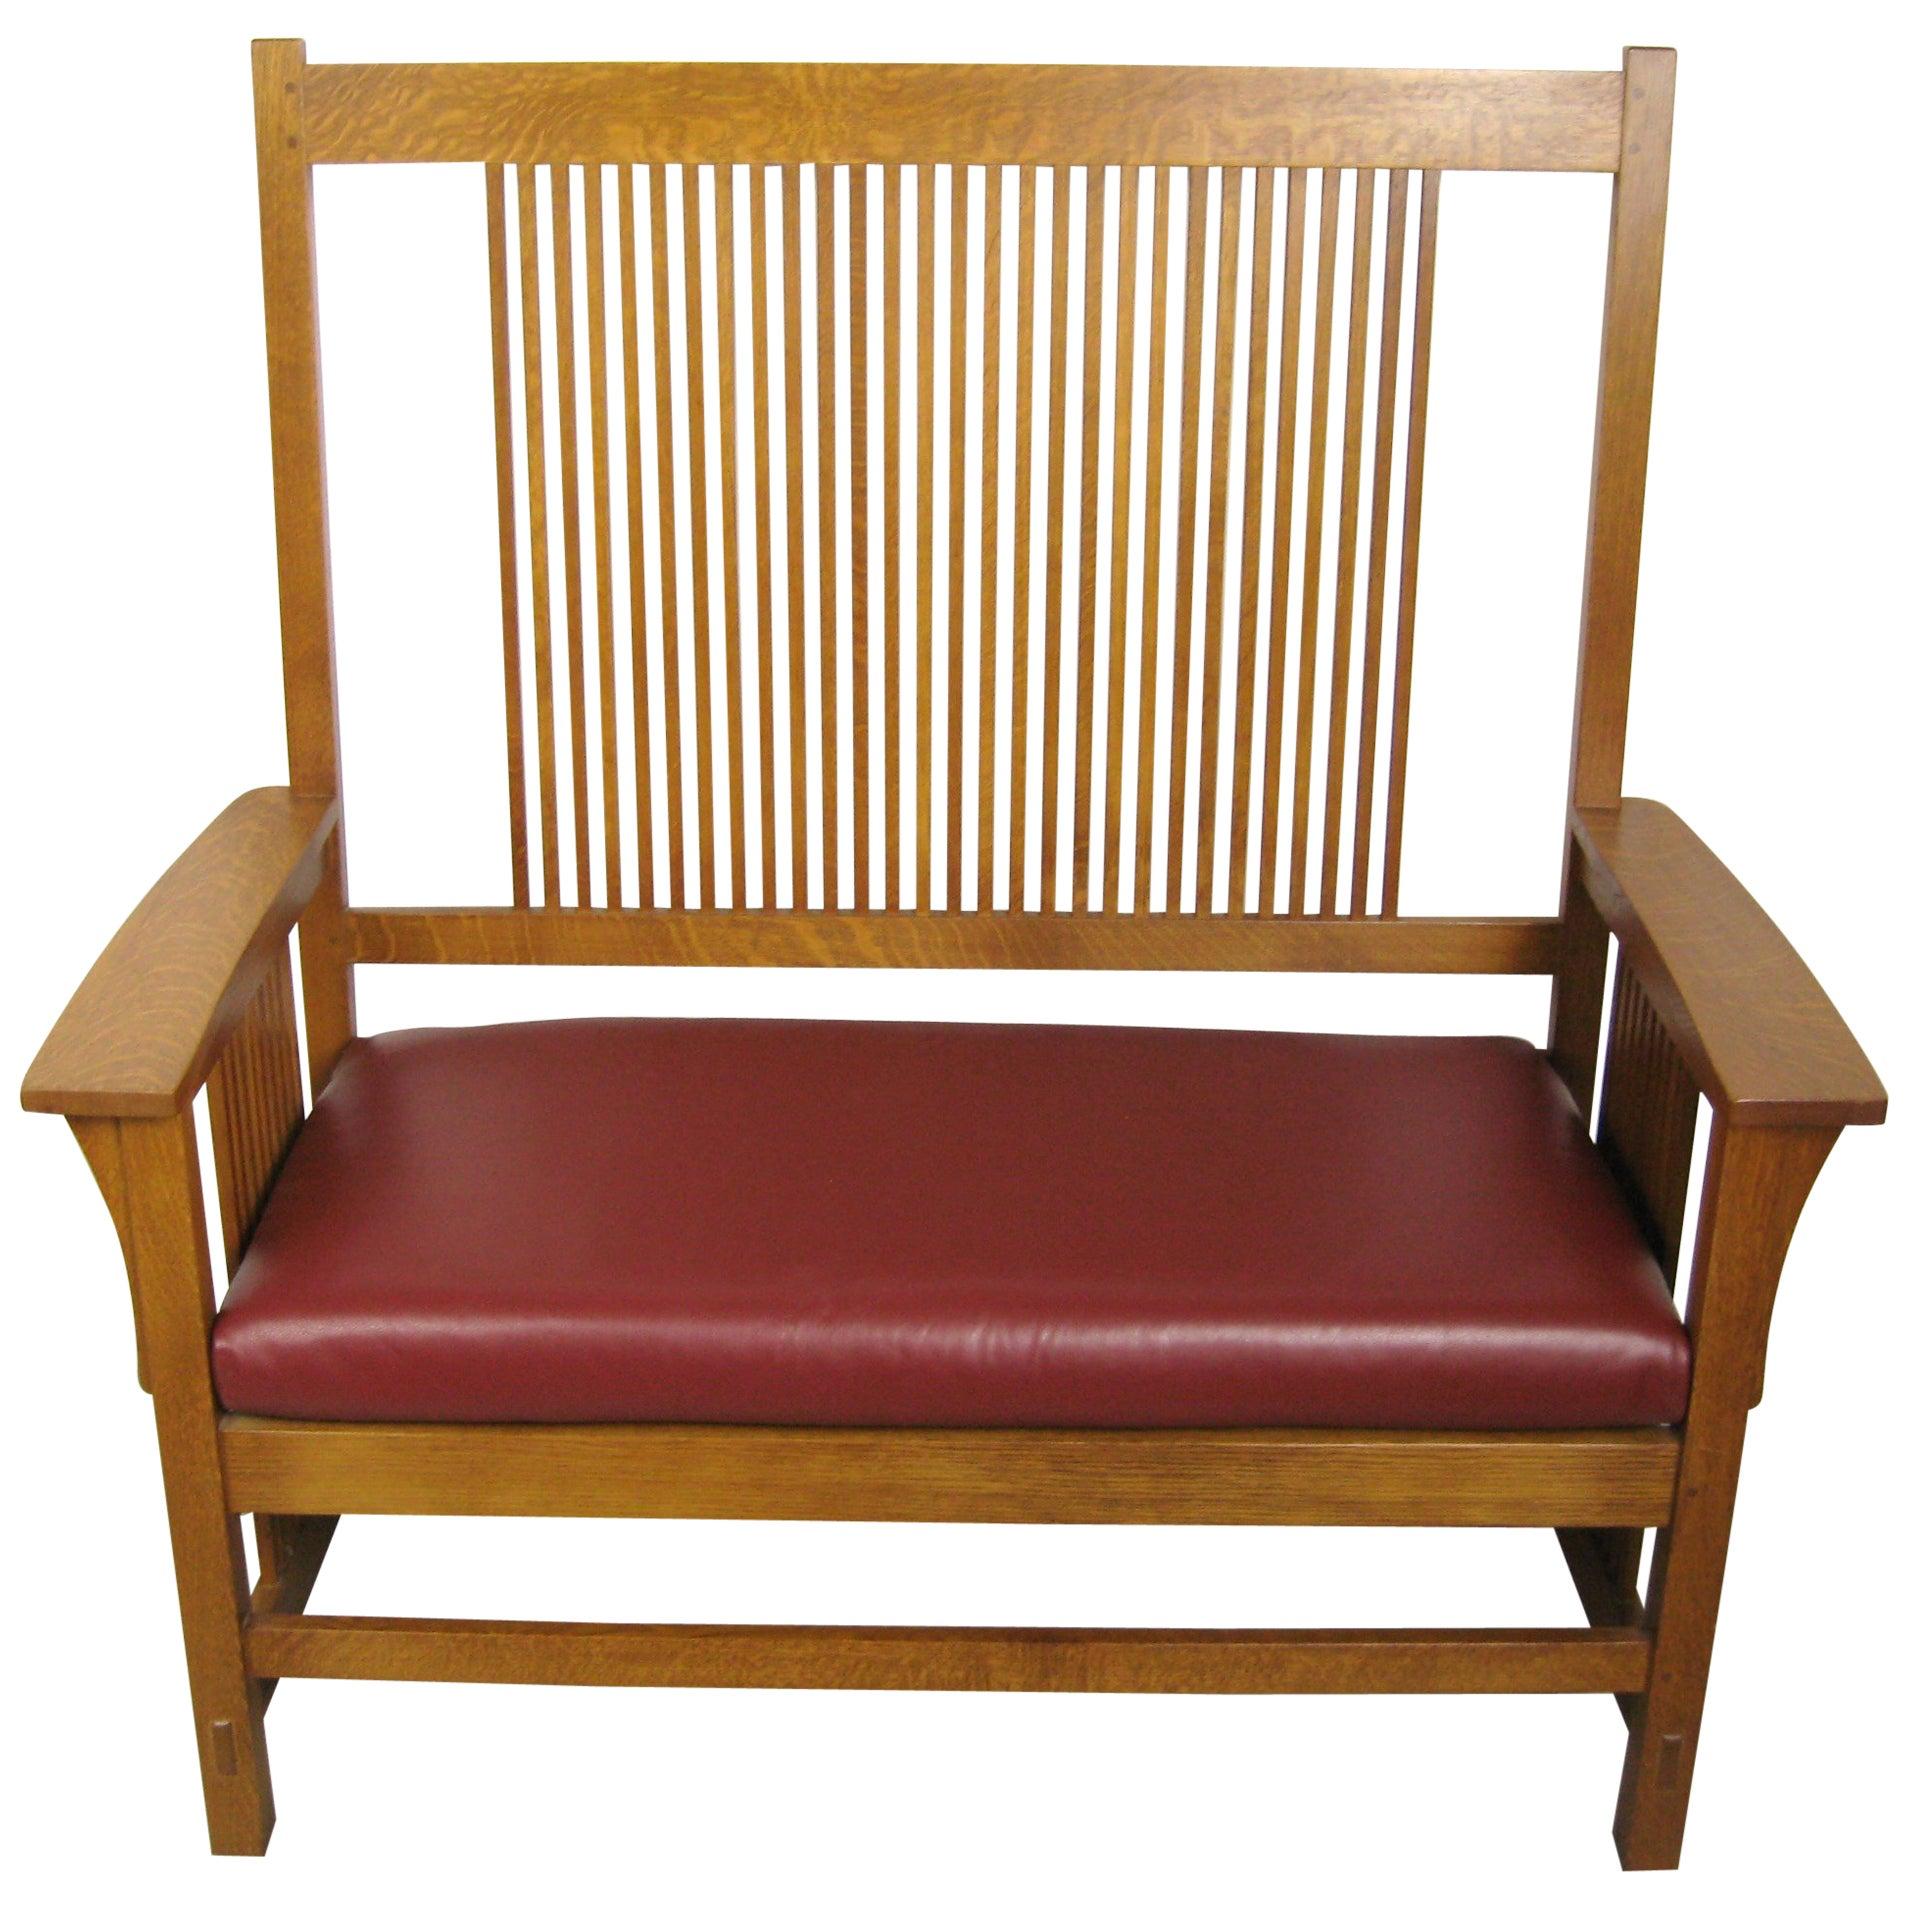 Stickley Mission Oak Arts & Crafts Settee Bench